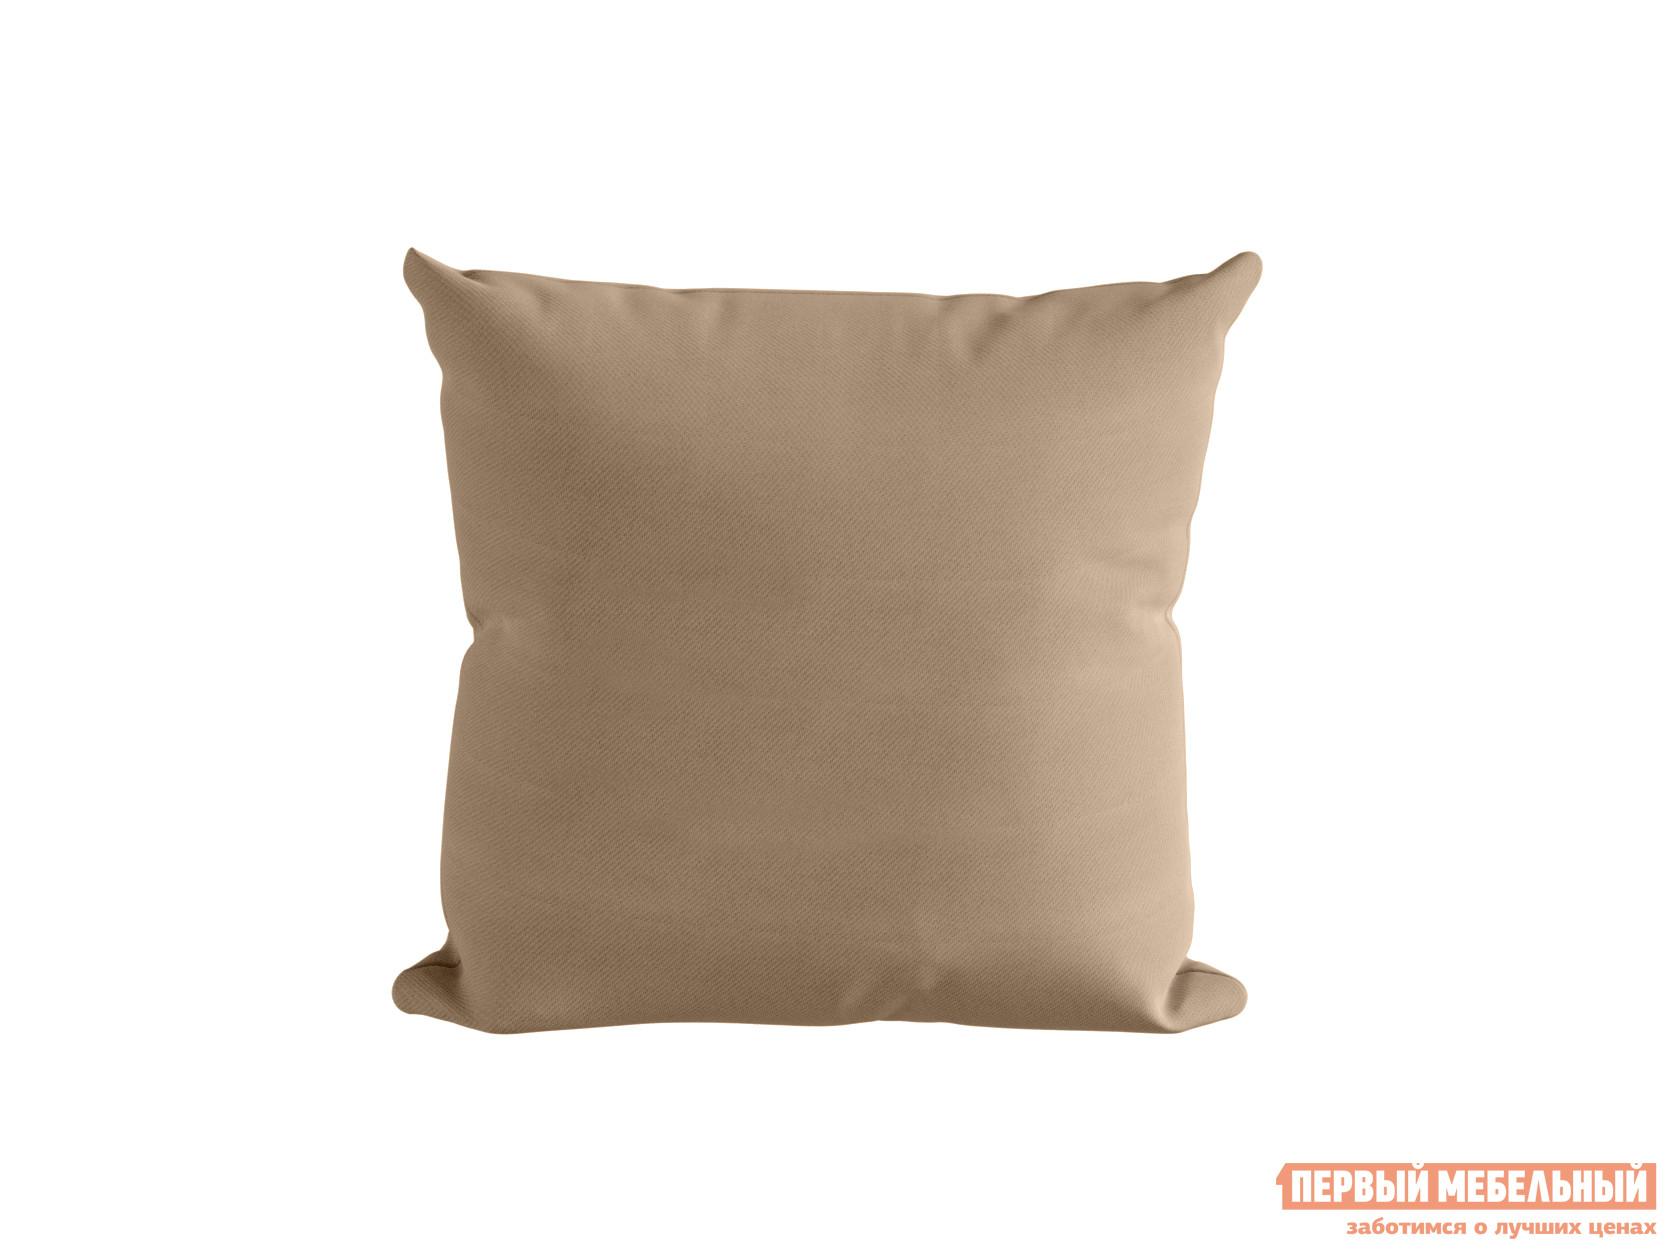 Декоративная подушка  Подушка ШН(11), Размер 45х45 Бежевый, блэкаут